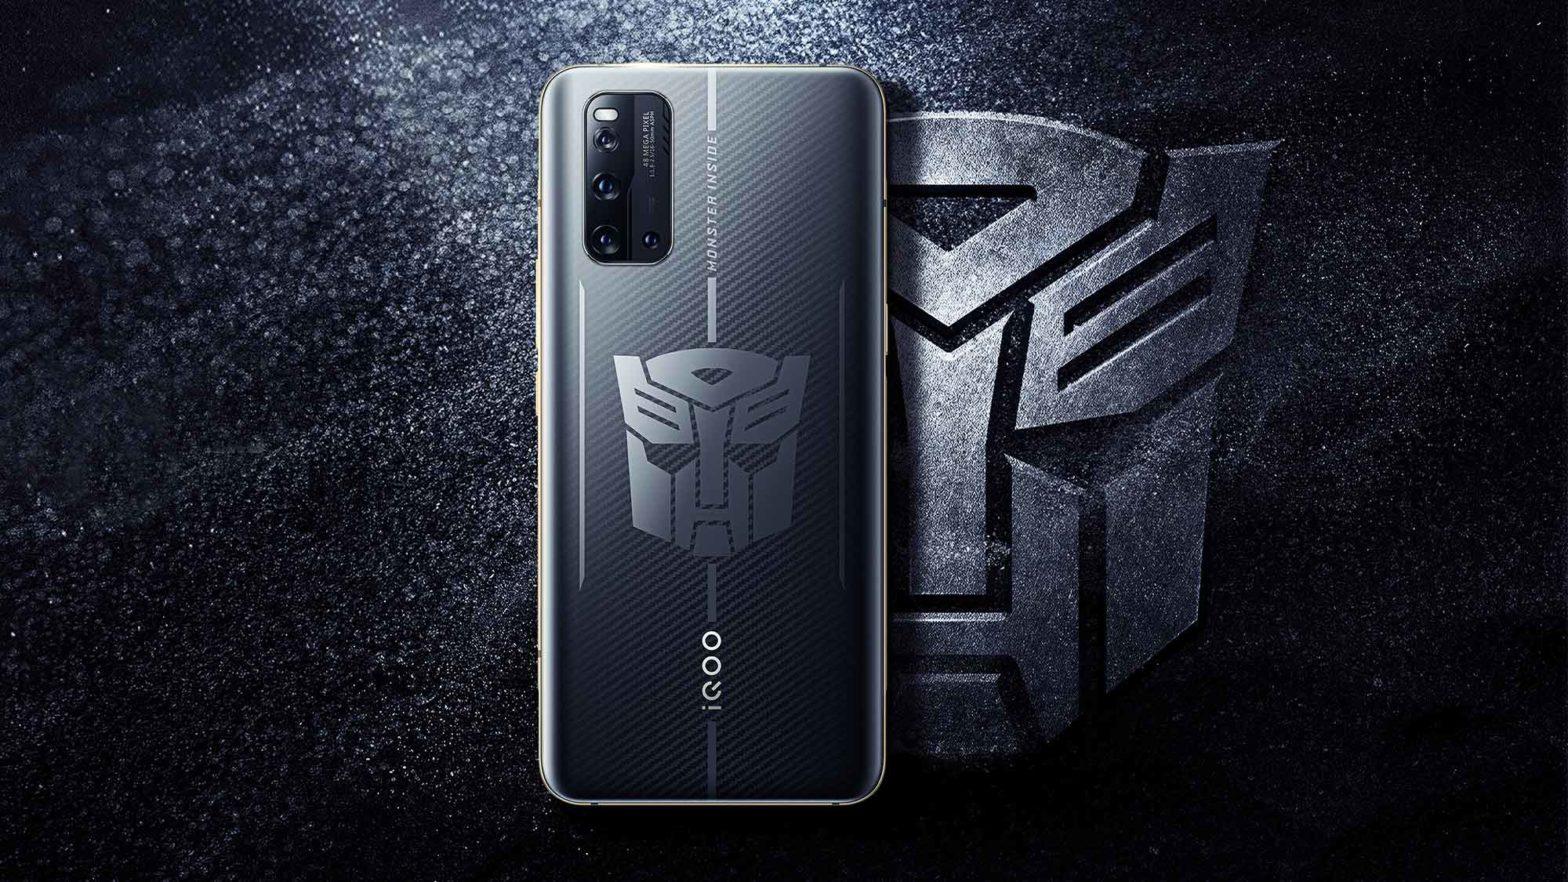 IQOO 3 Transformers Edition Smartphone